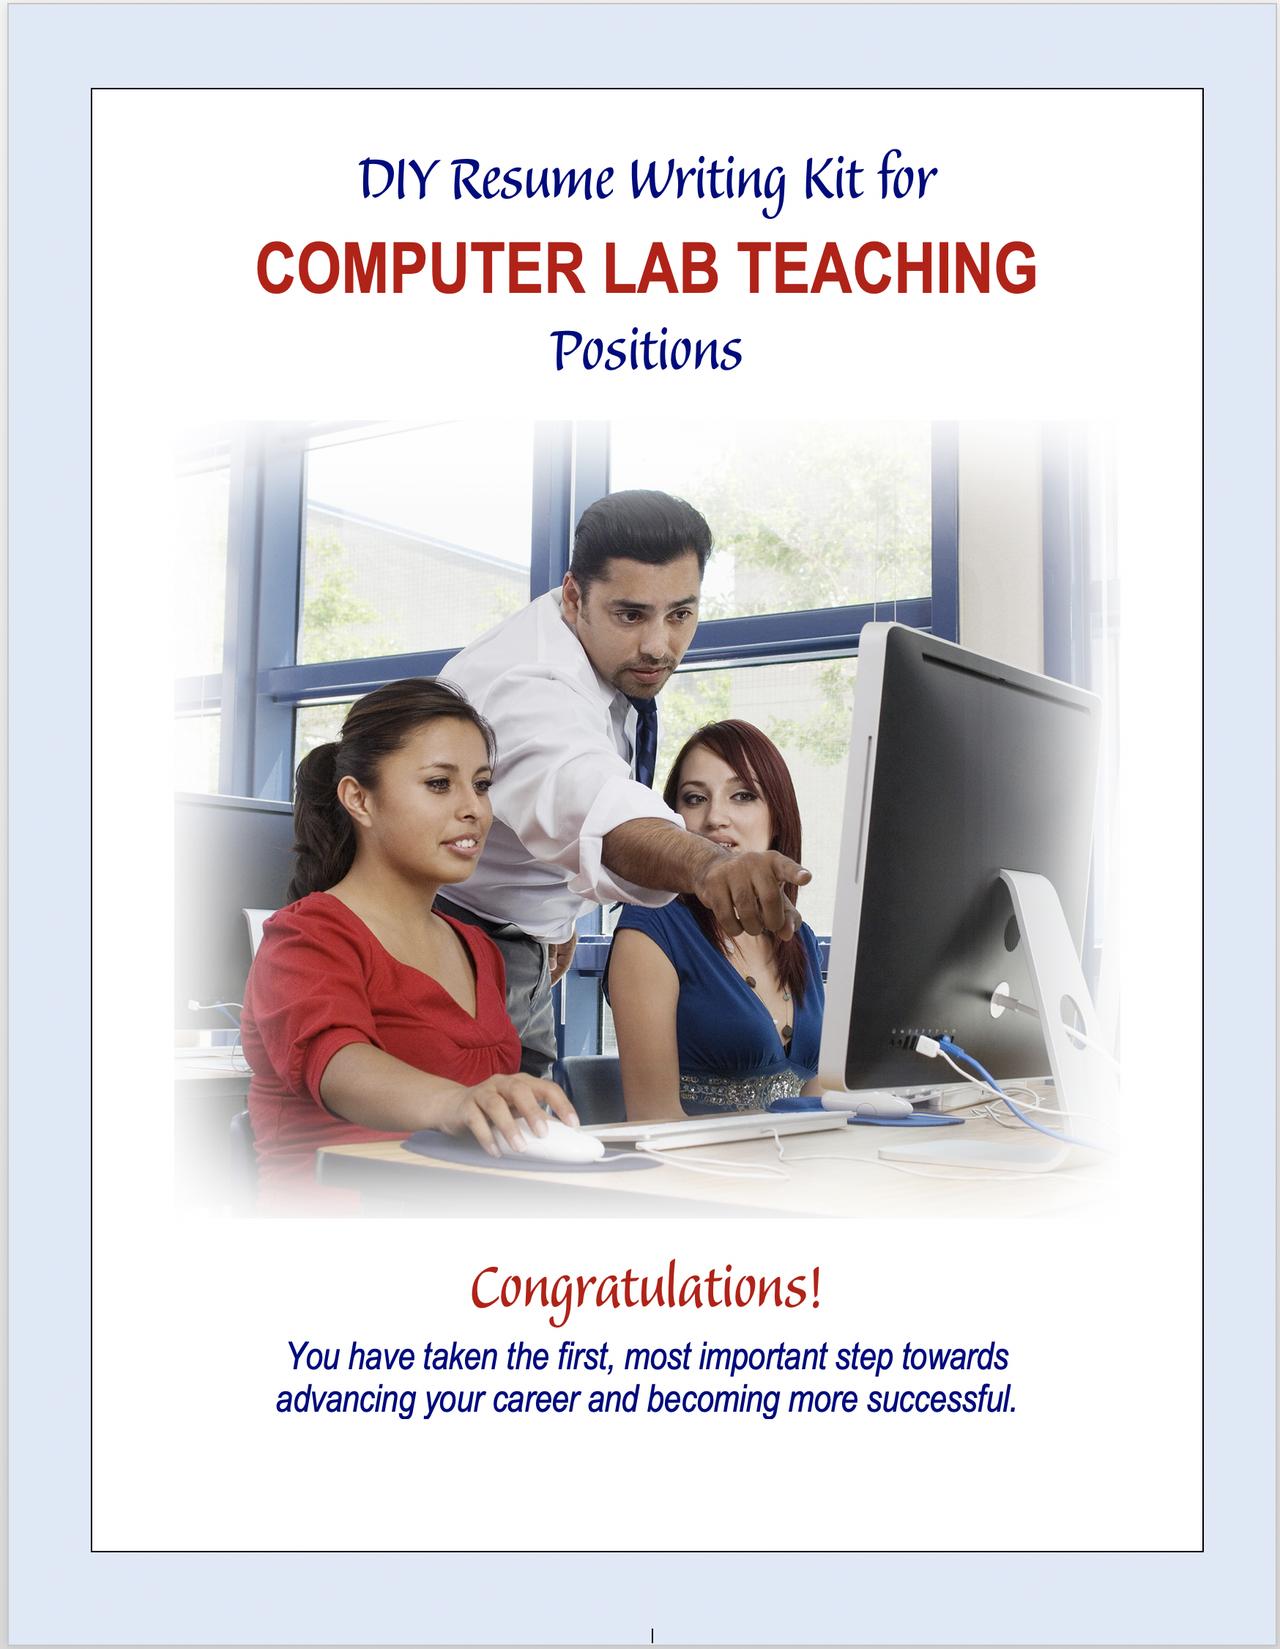 computer lab teaching.png